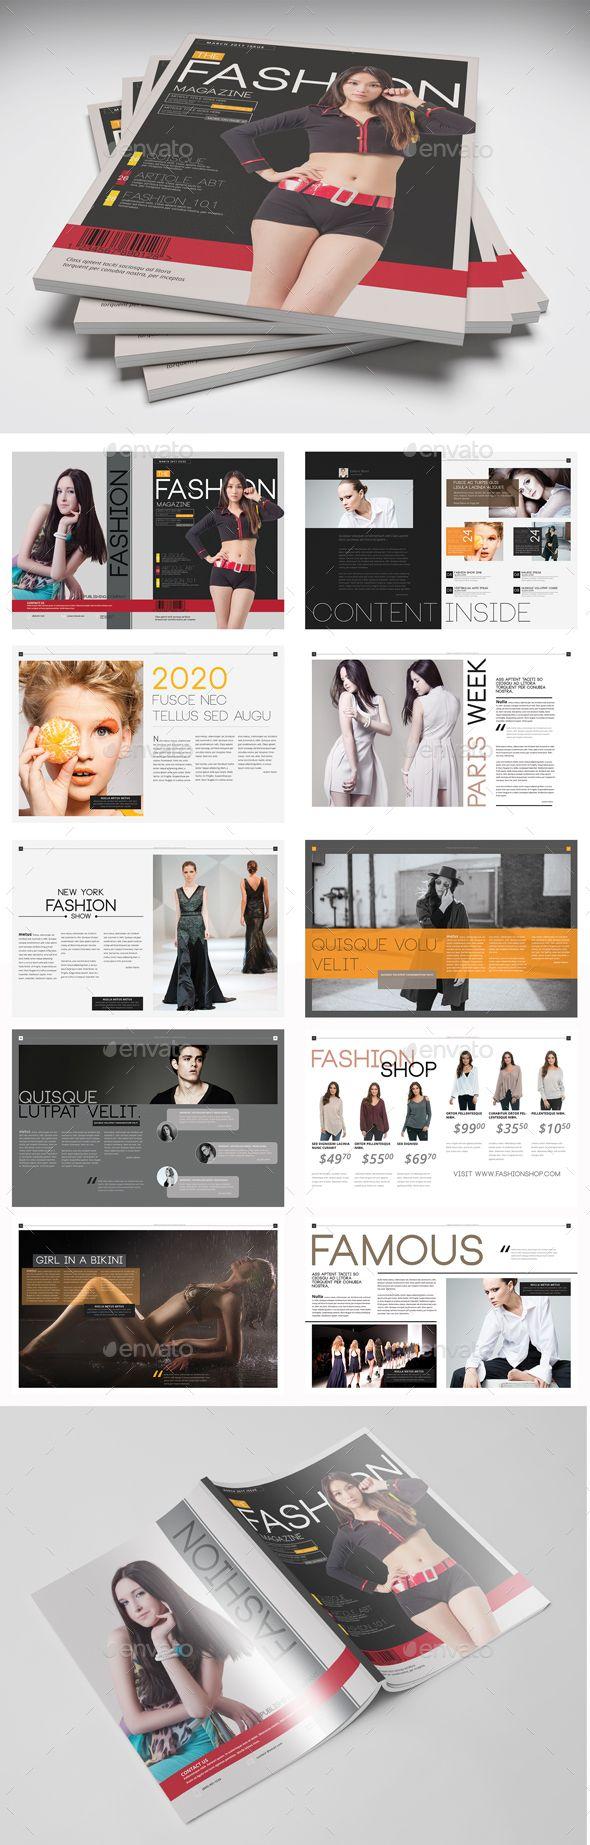 Template PSD Magazines Print